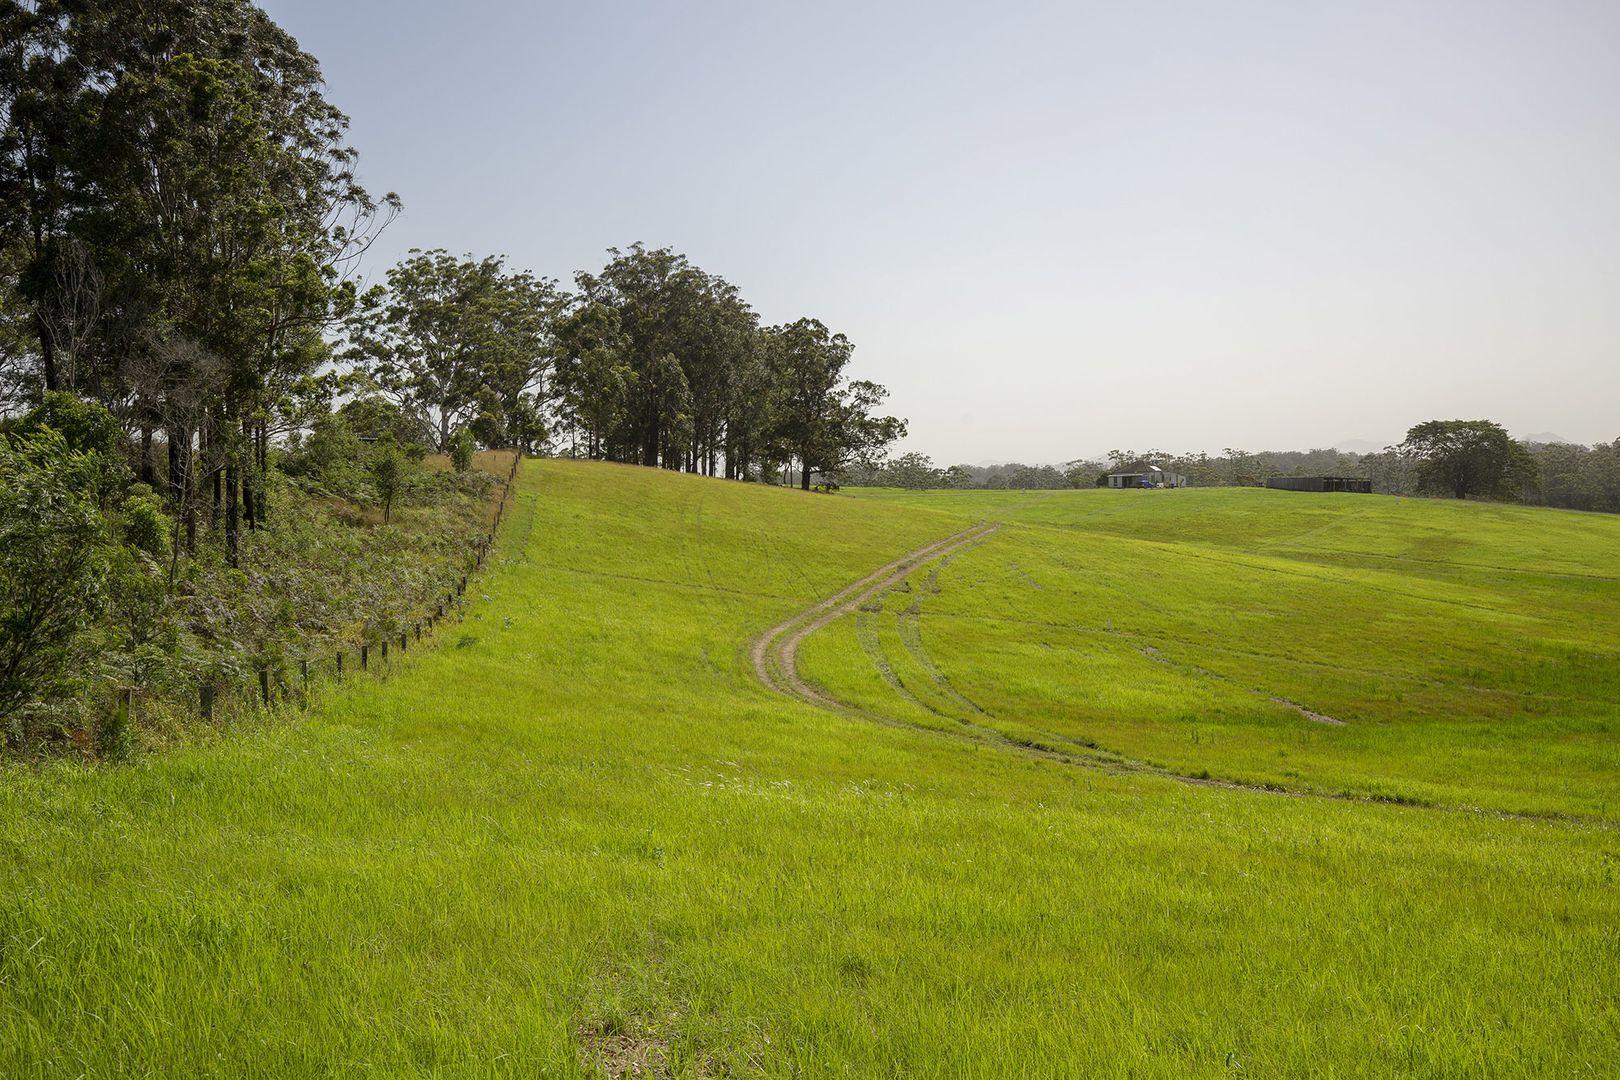 LOT 10/295 Wirrimbi Road, Nambucca Heads NSW 2448, Image 1